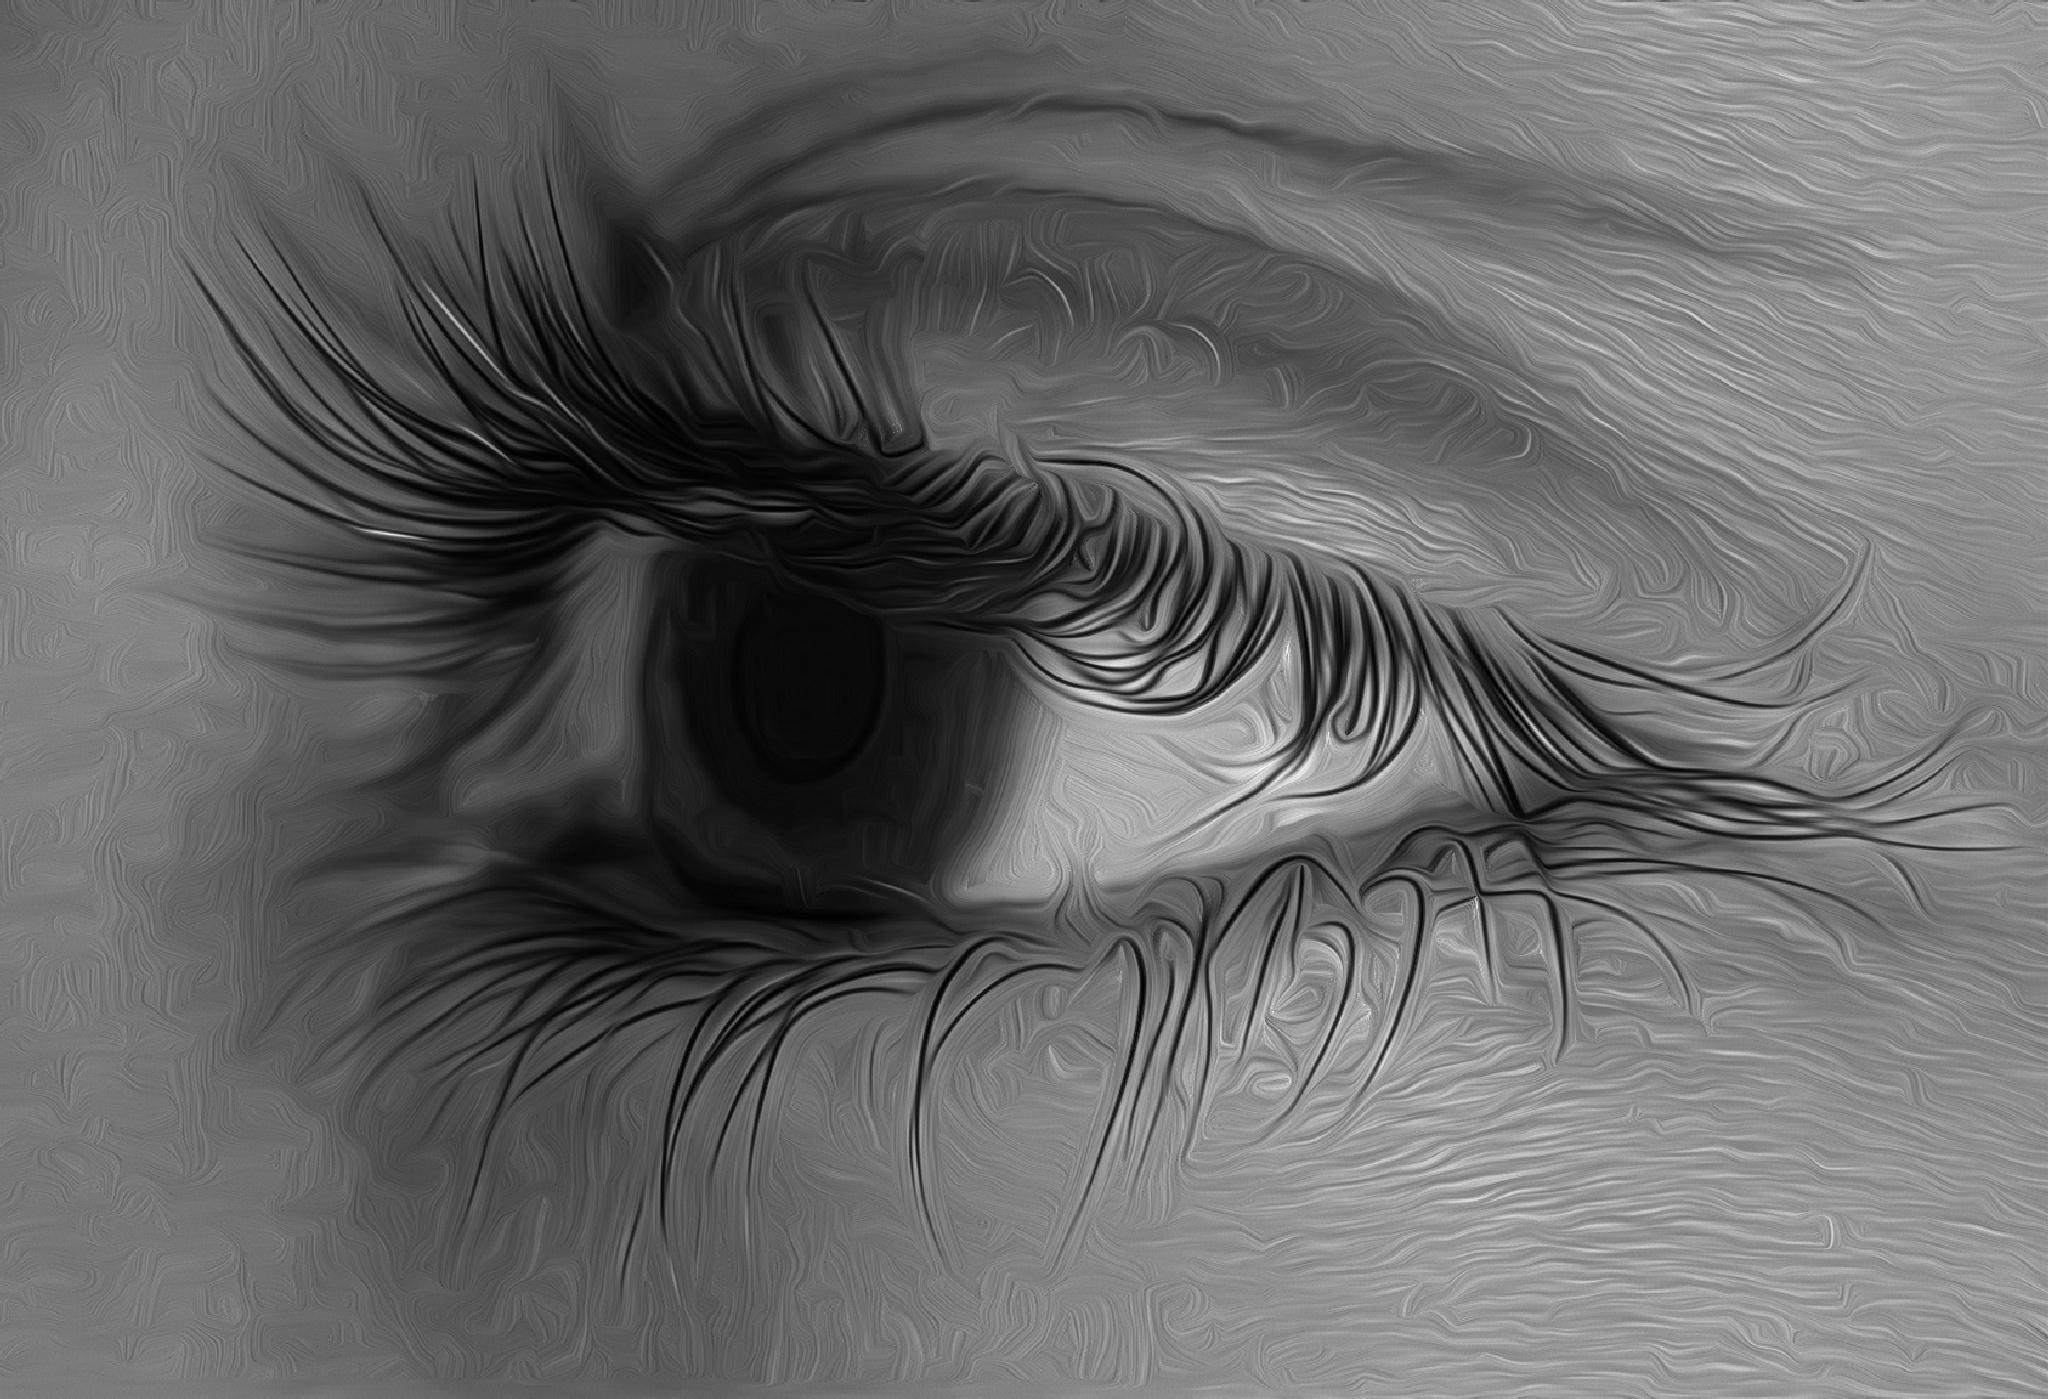 Innocent eyes by Hamoud Khaled